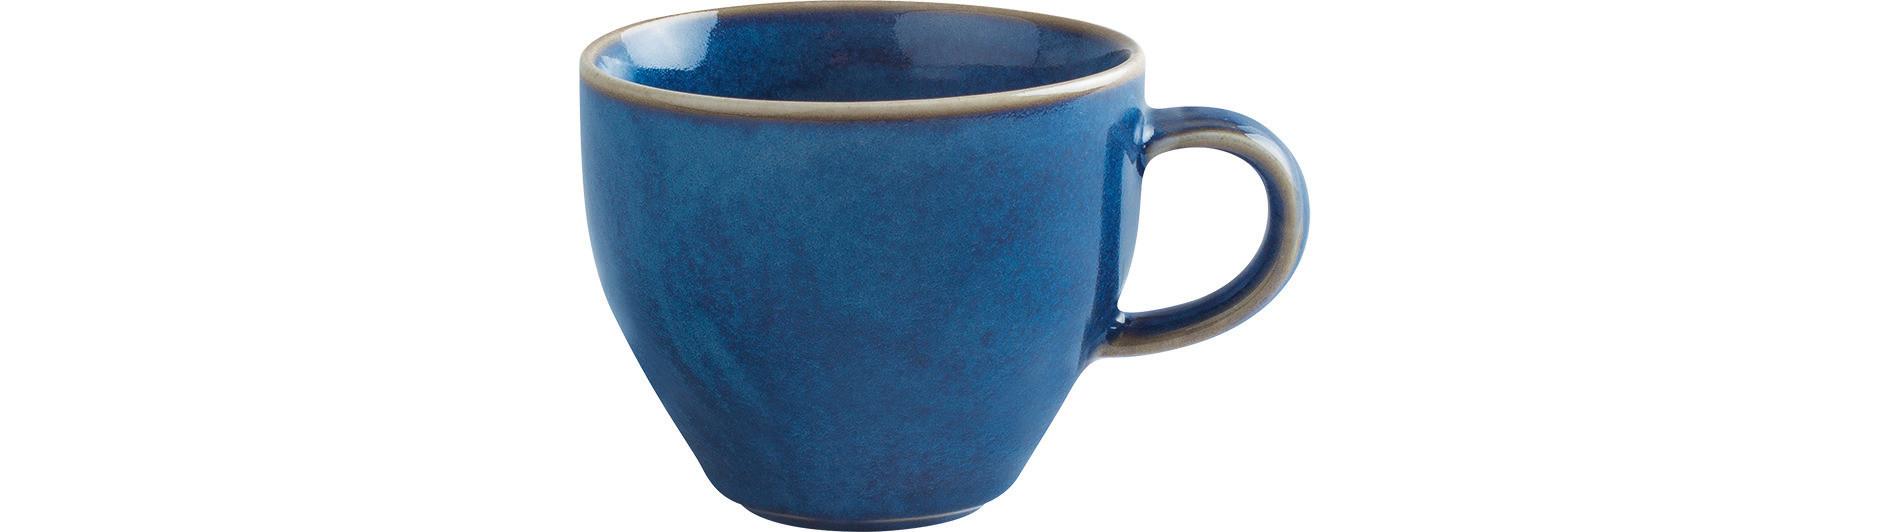 Homestyle, Milchkaffeetasse ø 101 mm / 0,30 l